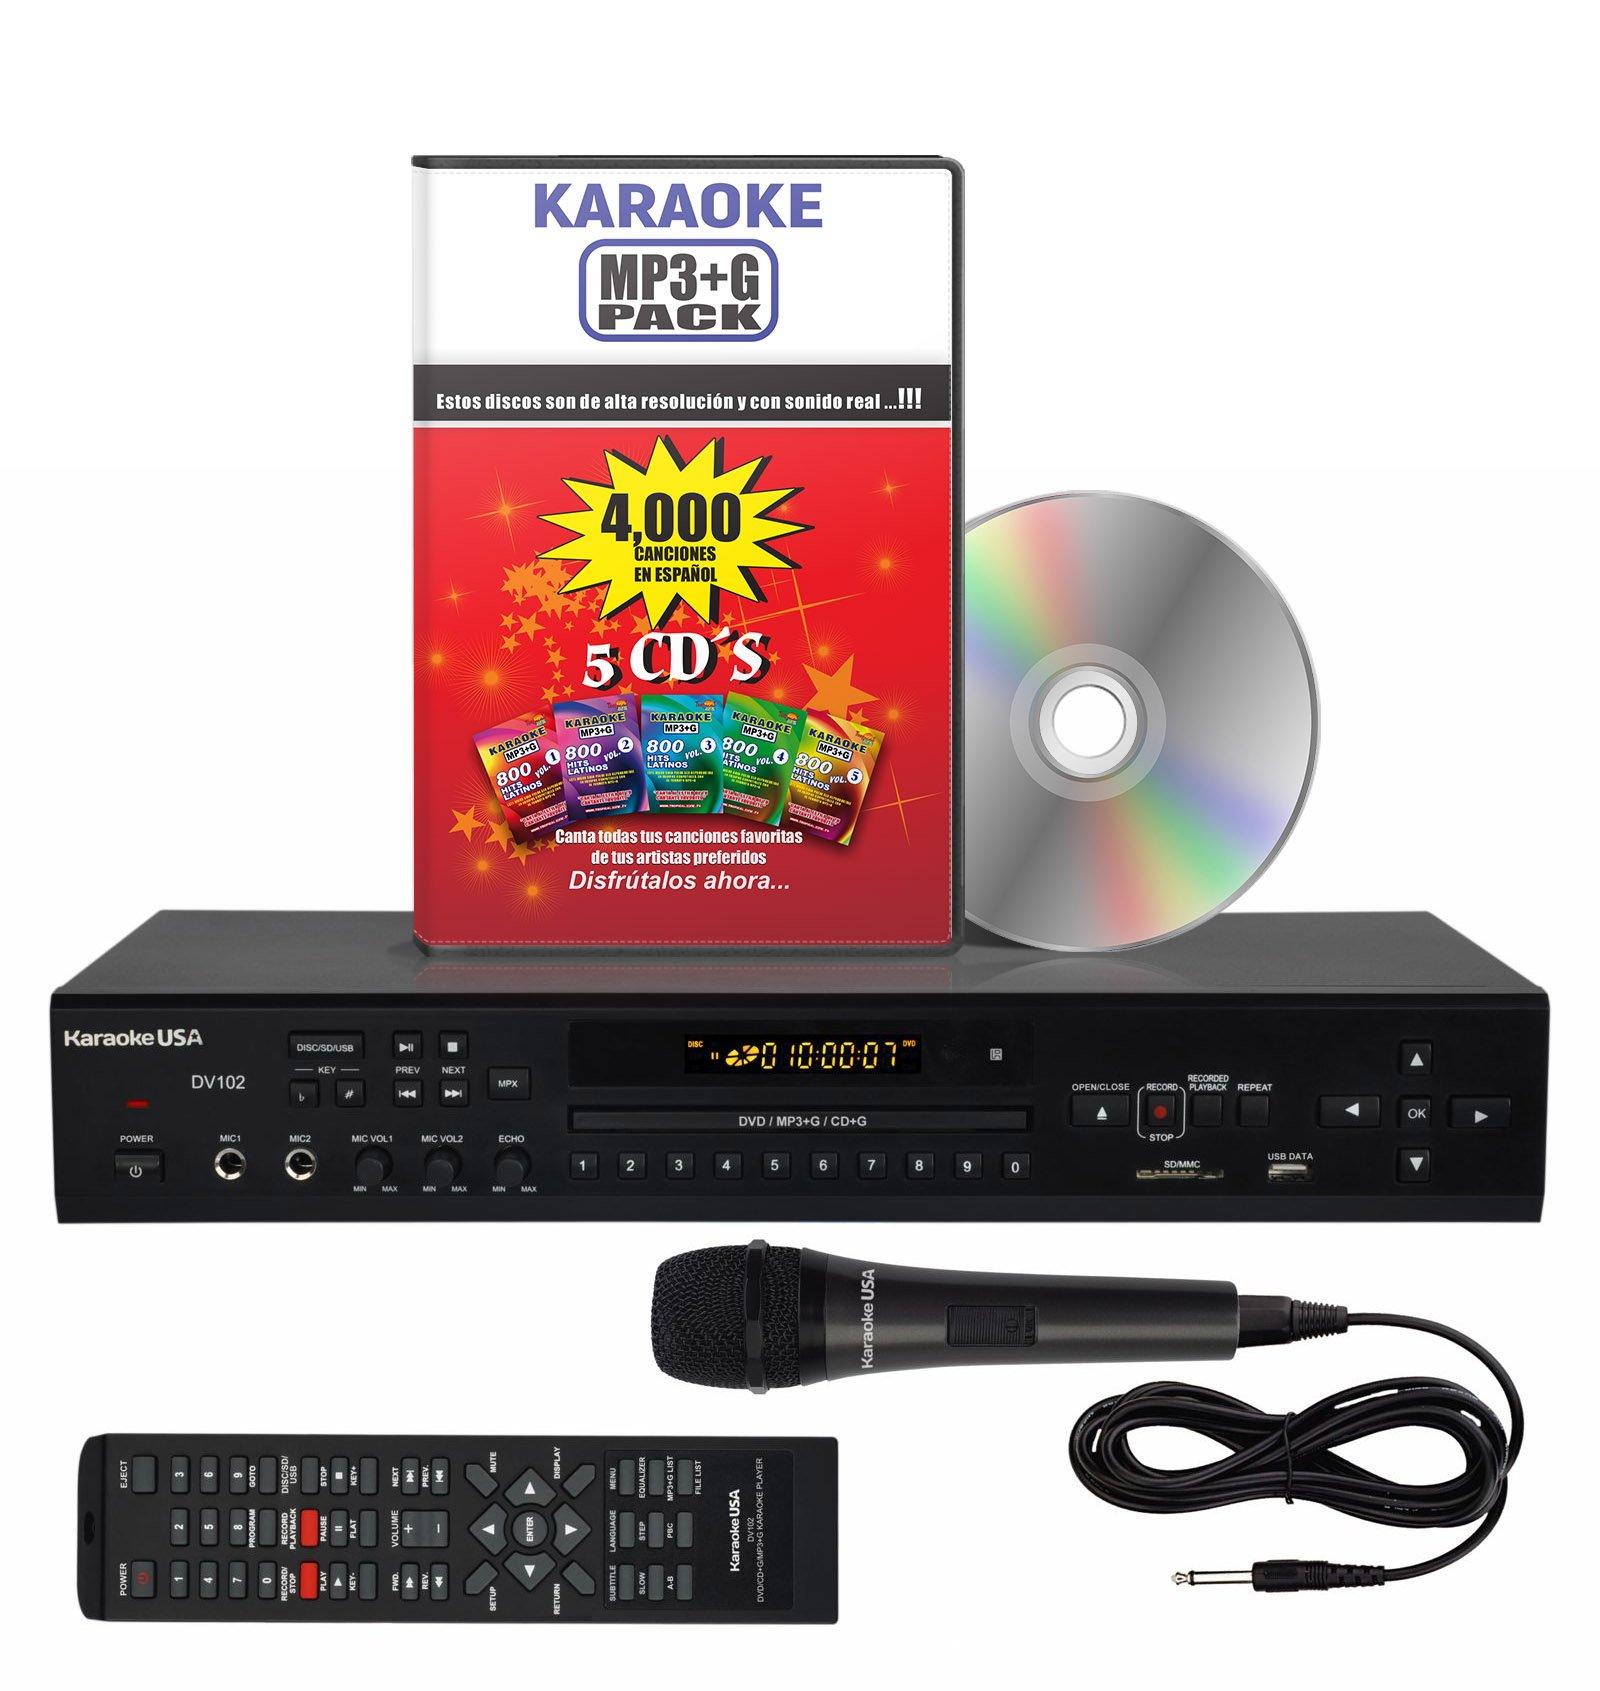 Karaoke Player SPANISH VERSION DV102 DVD/CDG/MP3G 4000 Songs